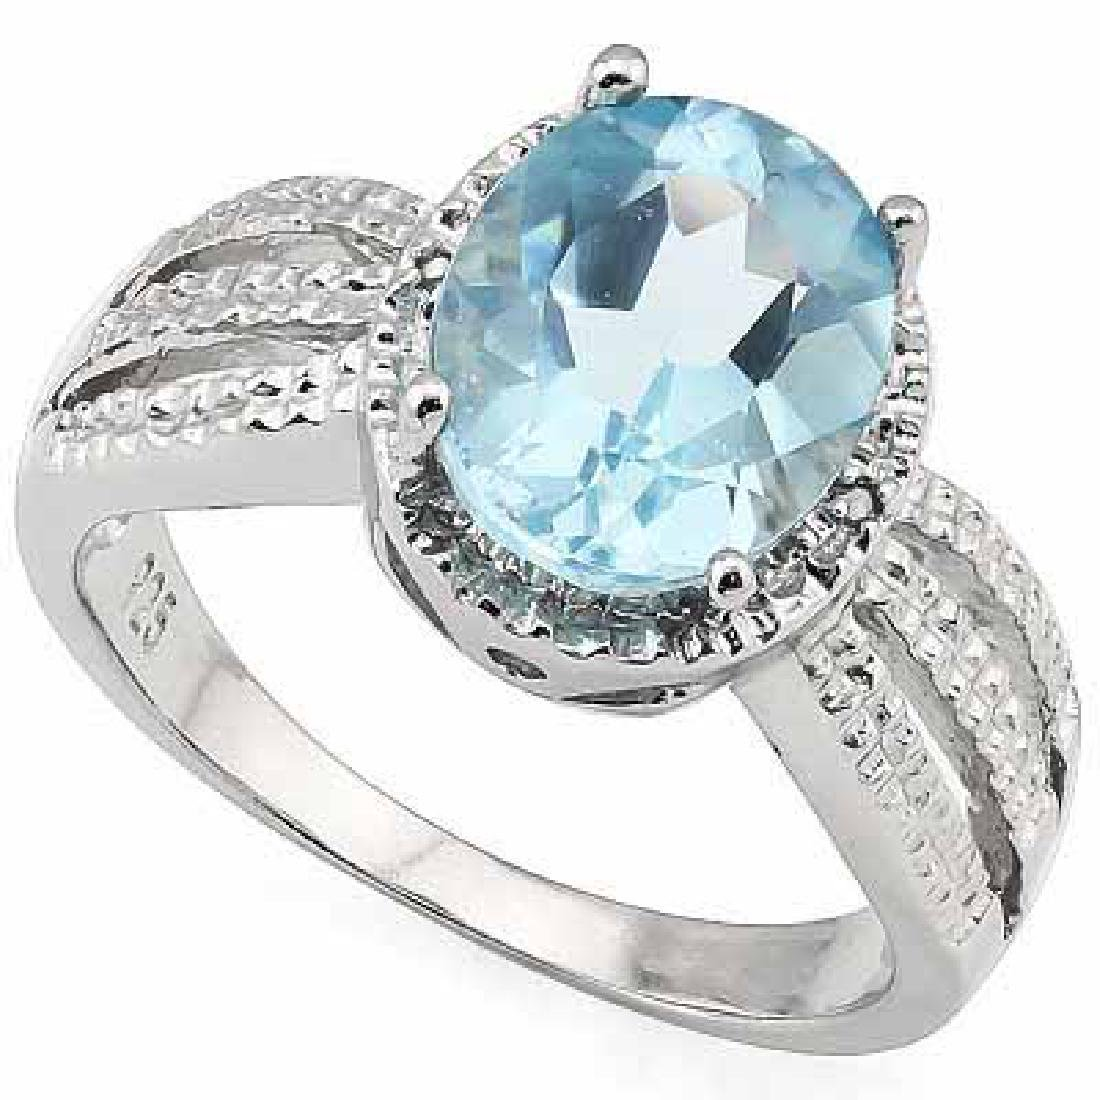 3.19 CARAT TW (3 PCS) BLUE TOPAZ & GENUINE DIAMOND PLAT